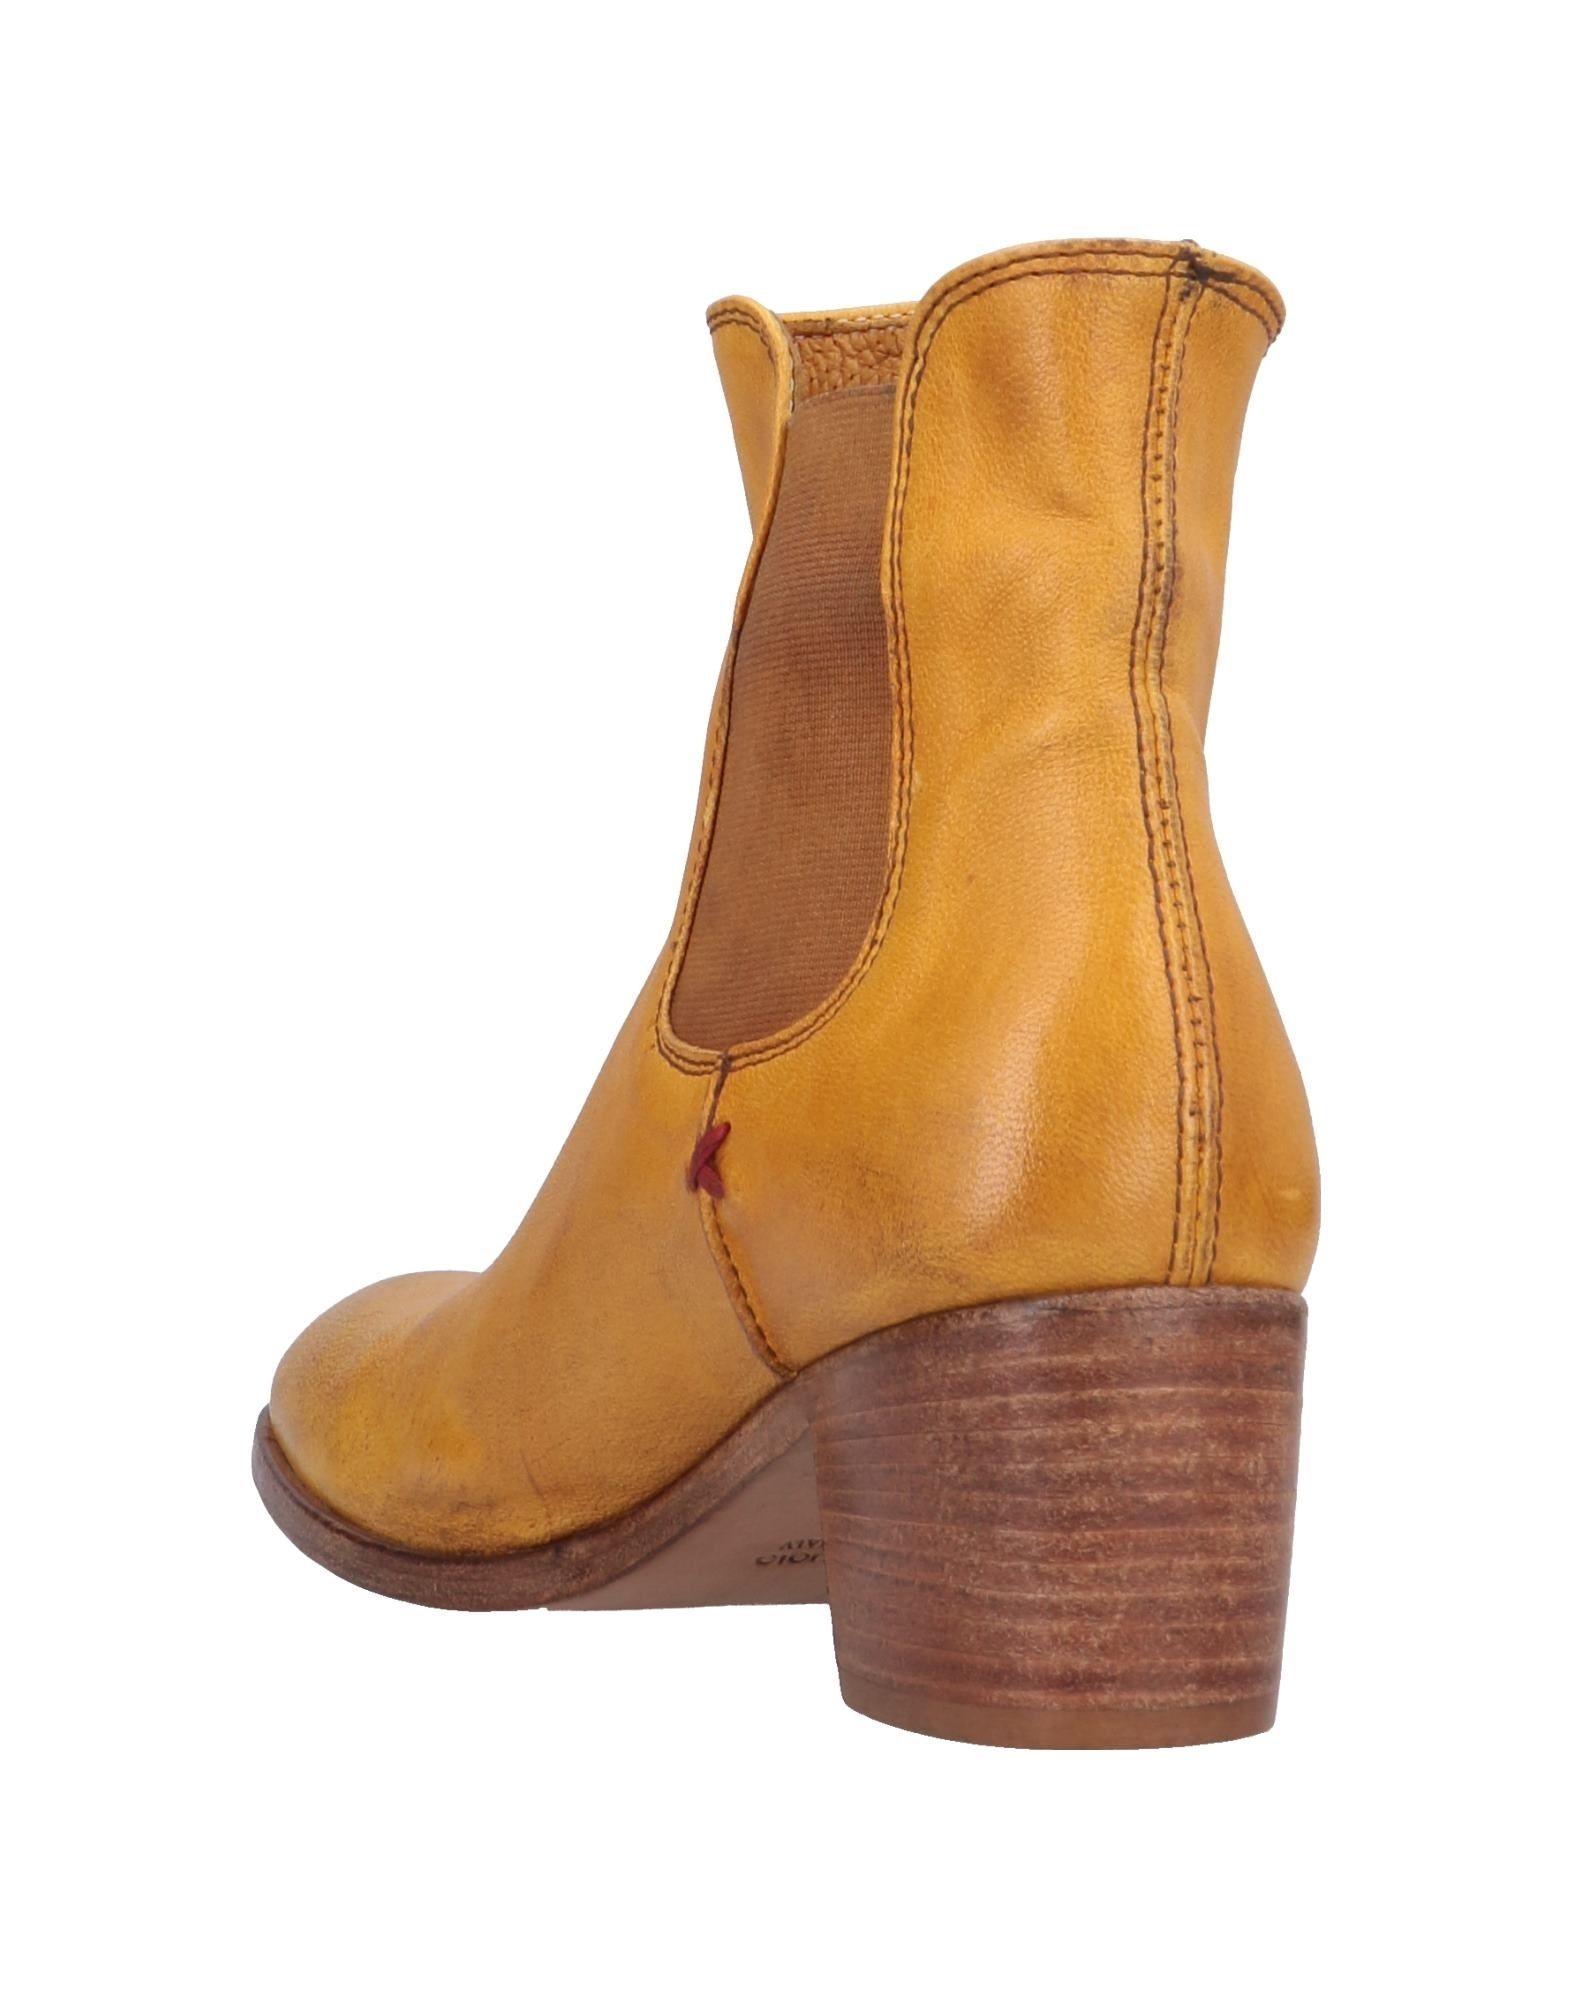 Stilvolle billige Schuhe Cavallini 11552745PK Chelsea Stiefel Damen  11552745PK Cavallini b7467c